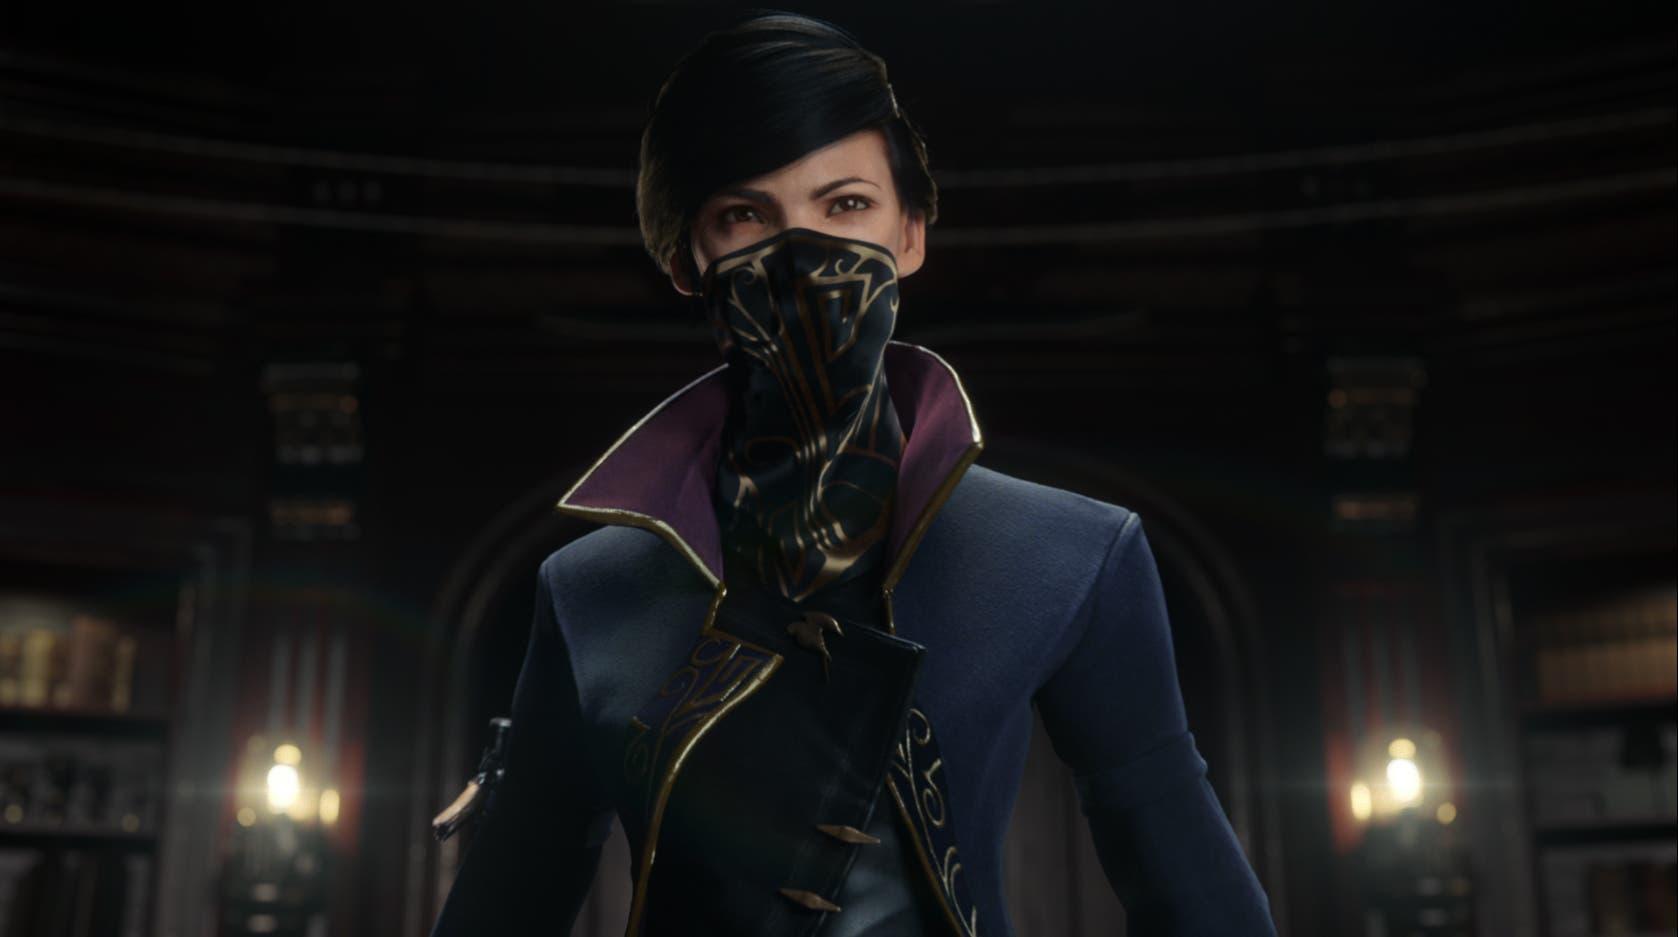 Primeras informaciones sobre Dishonored 2, juega como Emily o Corvo 1